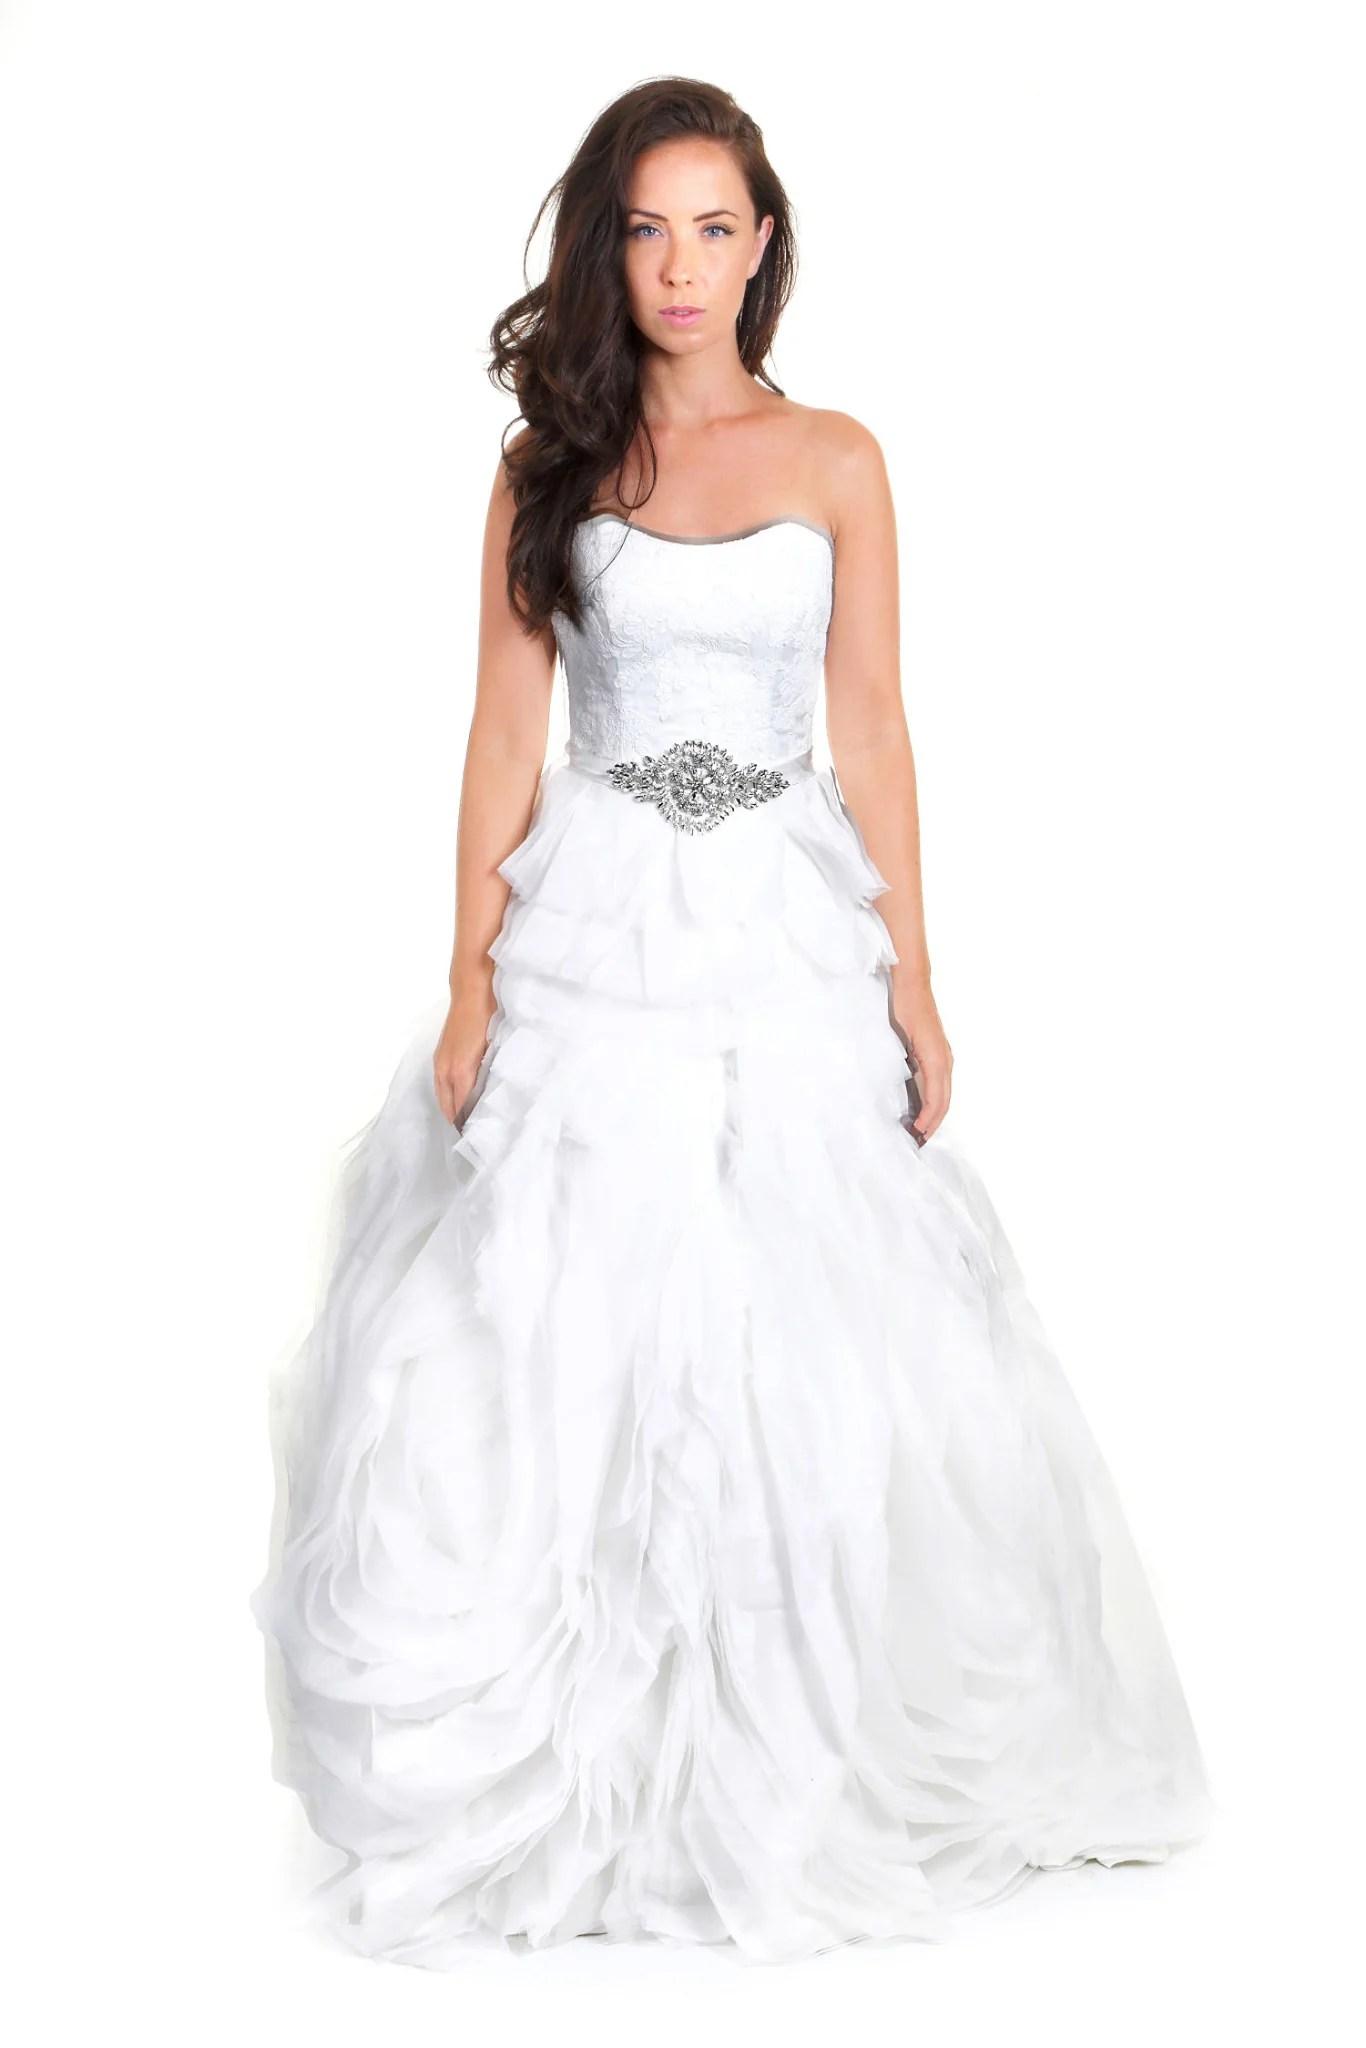 Exciting Size Convertible Wedding Dress Stella York Detachable Two Wedding Dress Sophia V Convertible Wedding Dress Two Piece Wedding Wedding Dress wedding dress Convertible Wedding Dress